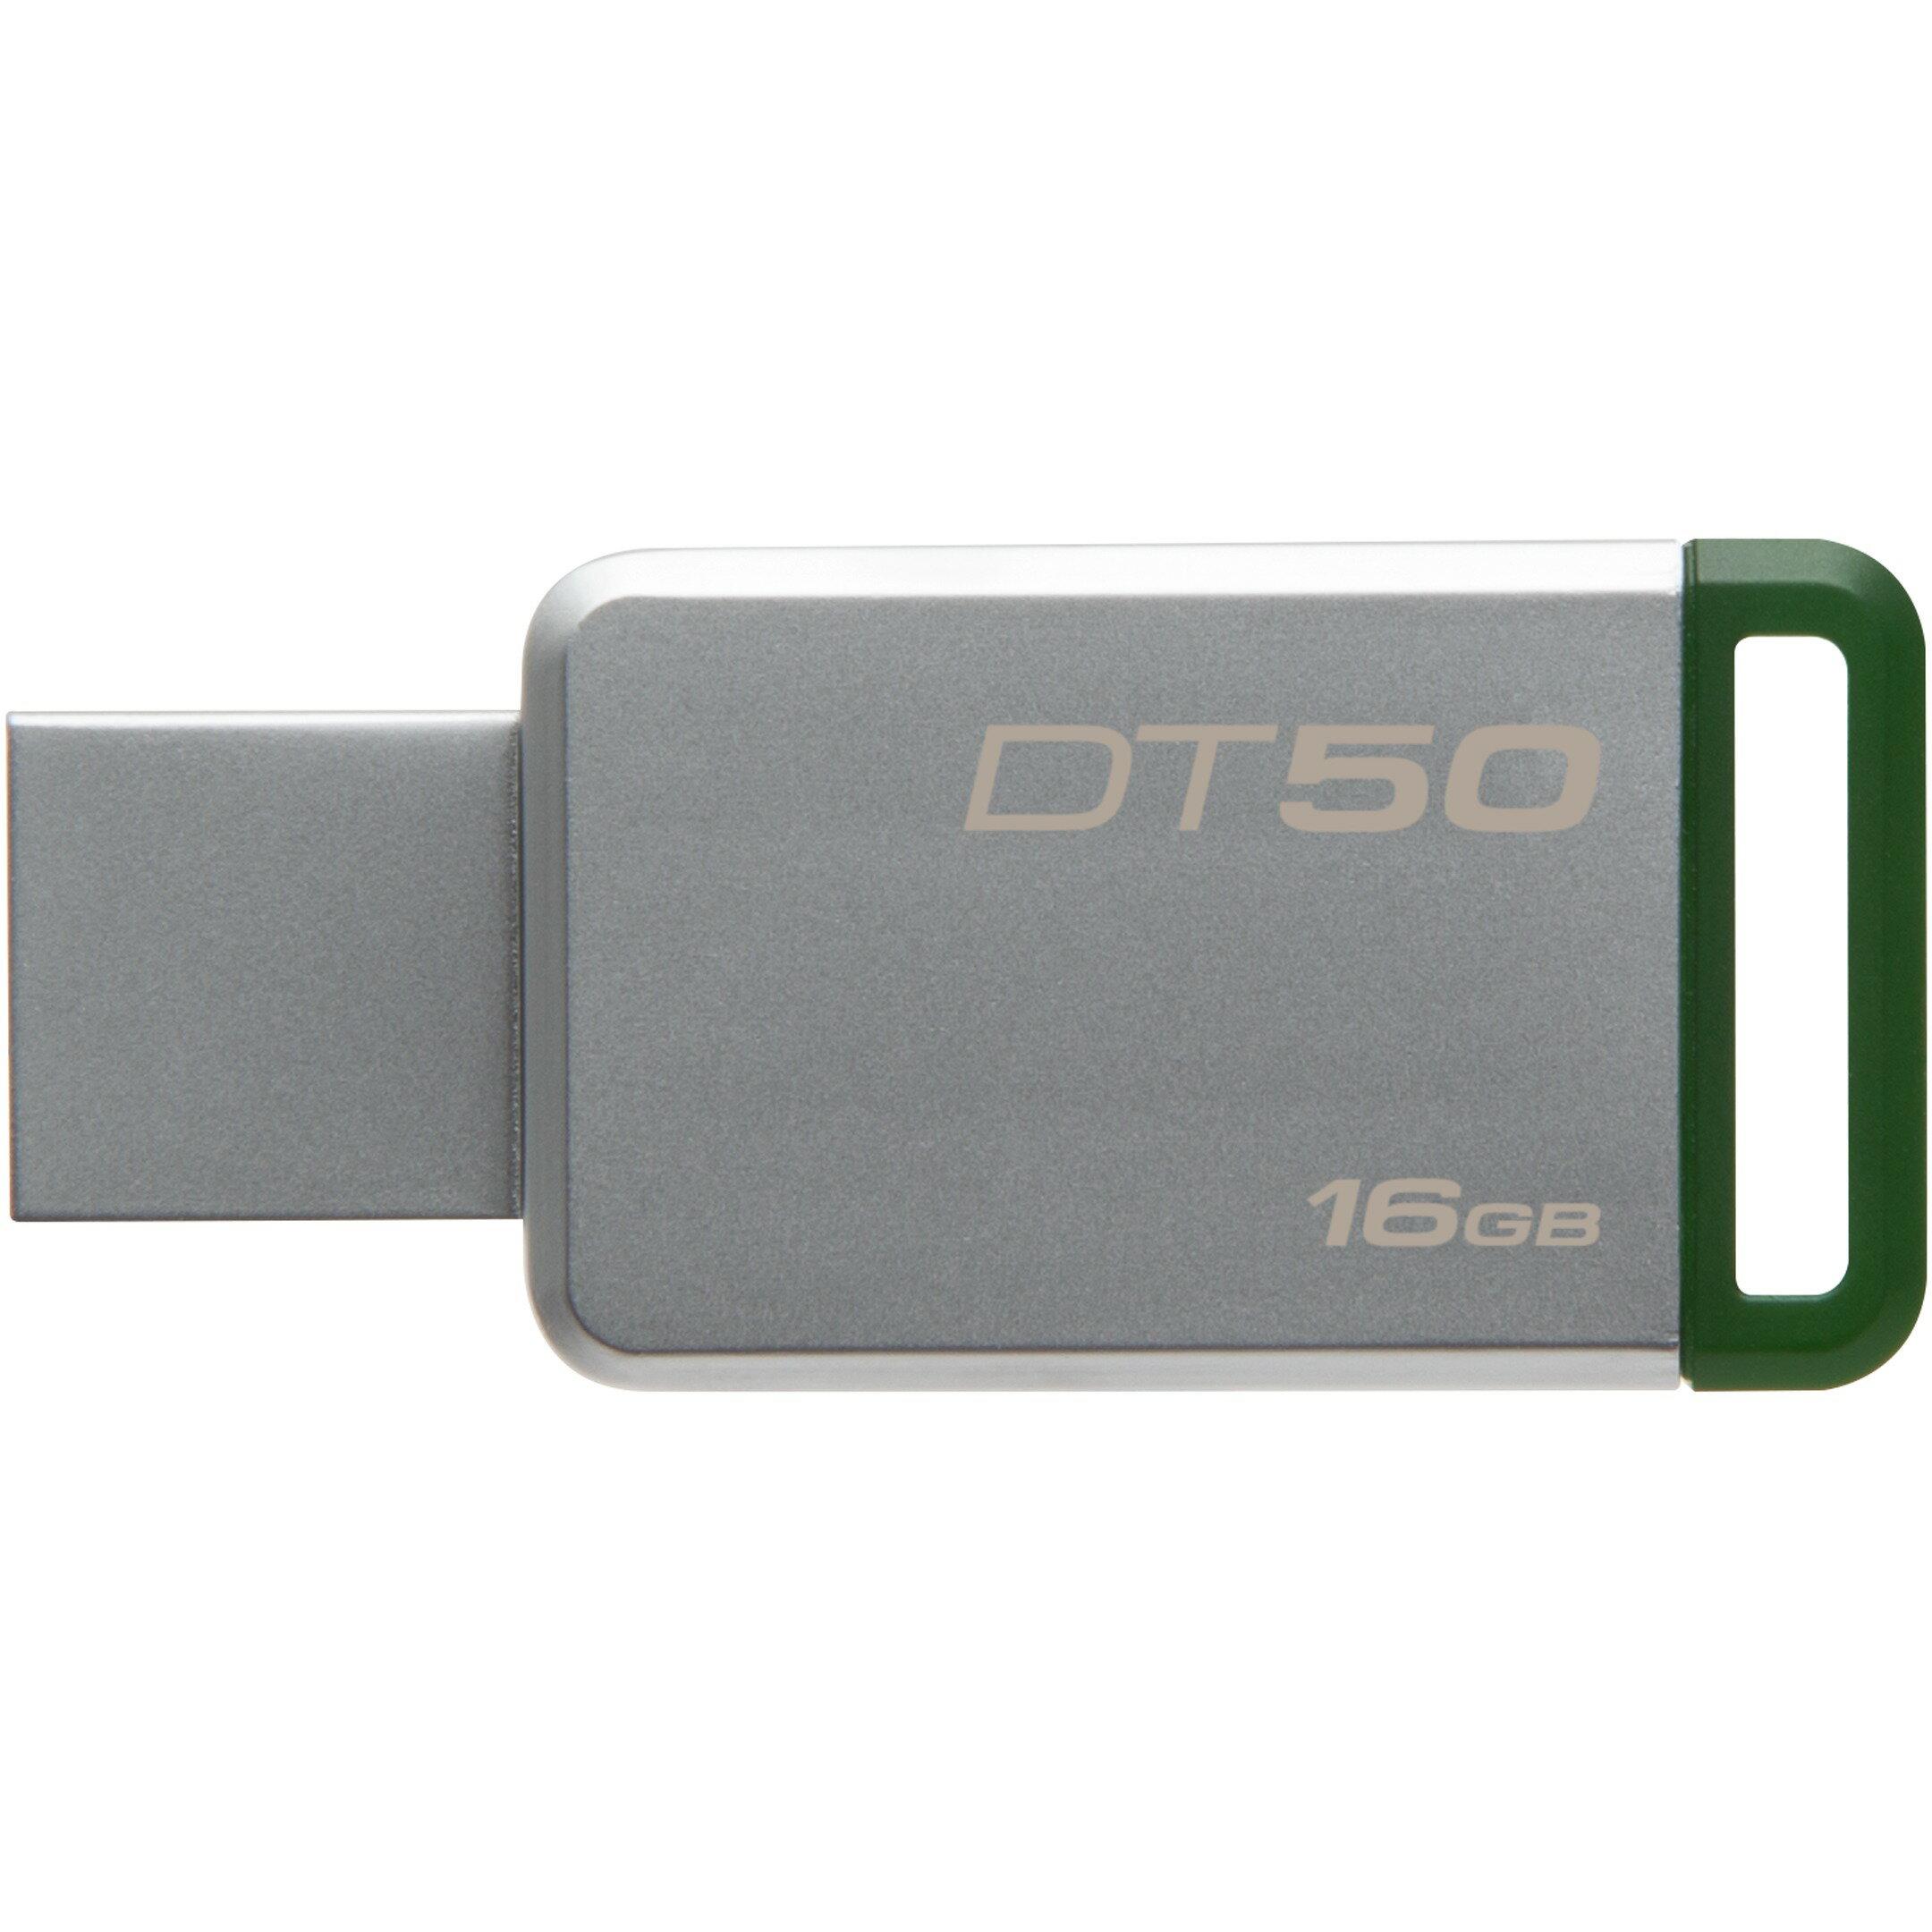 Kingston 16GB DataTraveler 50 16G DT50 USB 3.1 Gen 1 USB 3.0 30MB/s Flash Pen Thumb Drive DT50/16GB 1